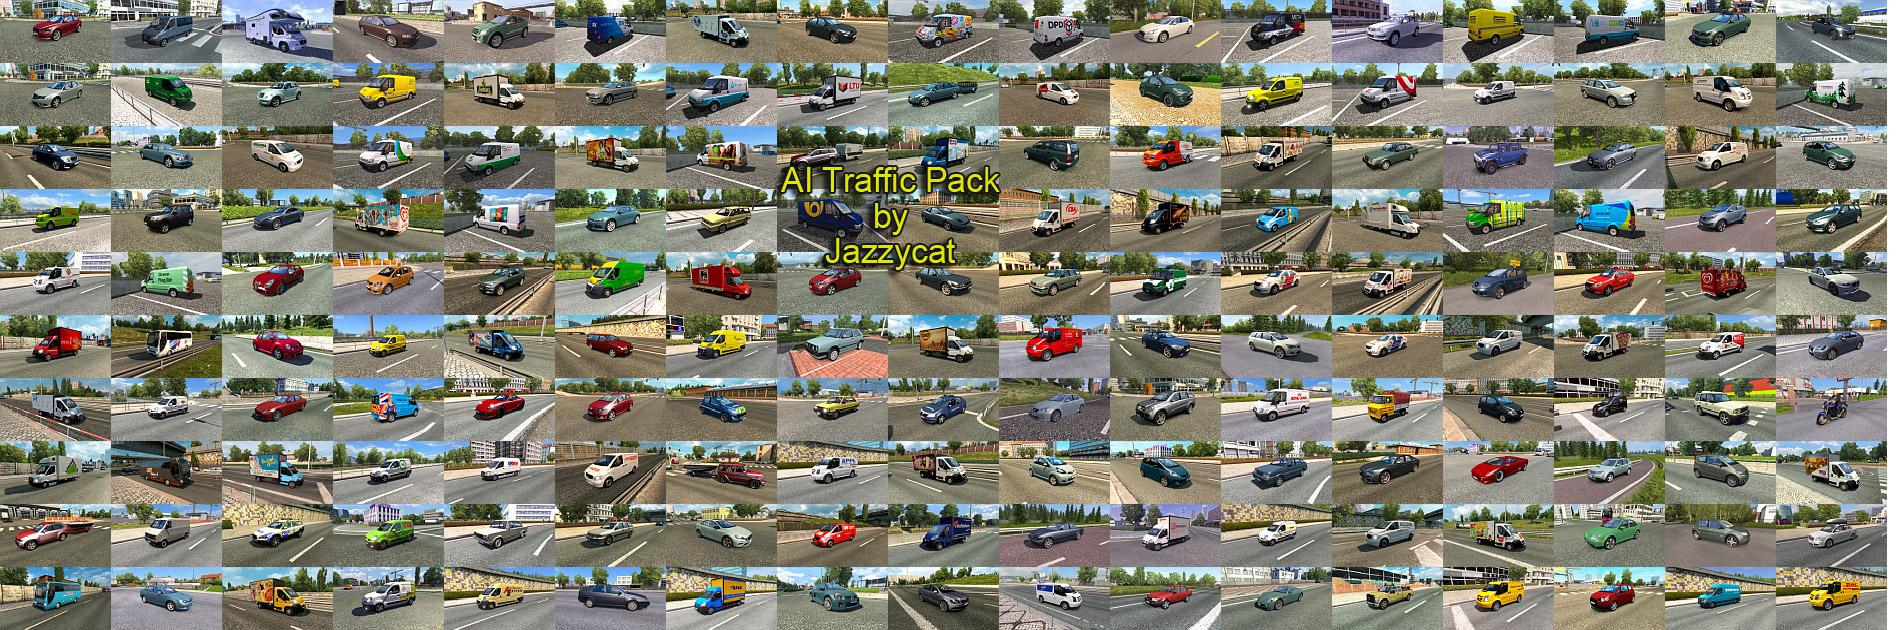 Ai Traffic Pack By Jazzycat V4 2 Ets2 Ets2 Mod